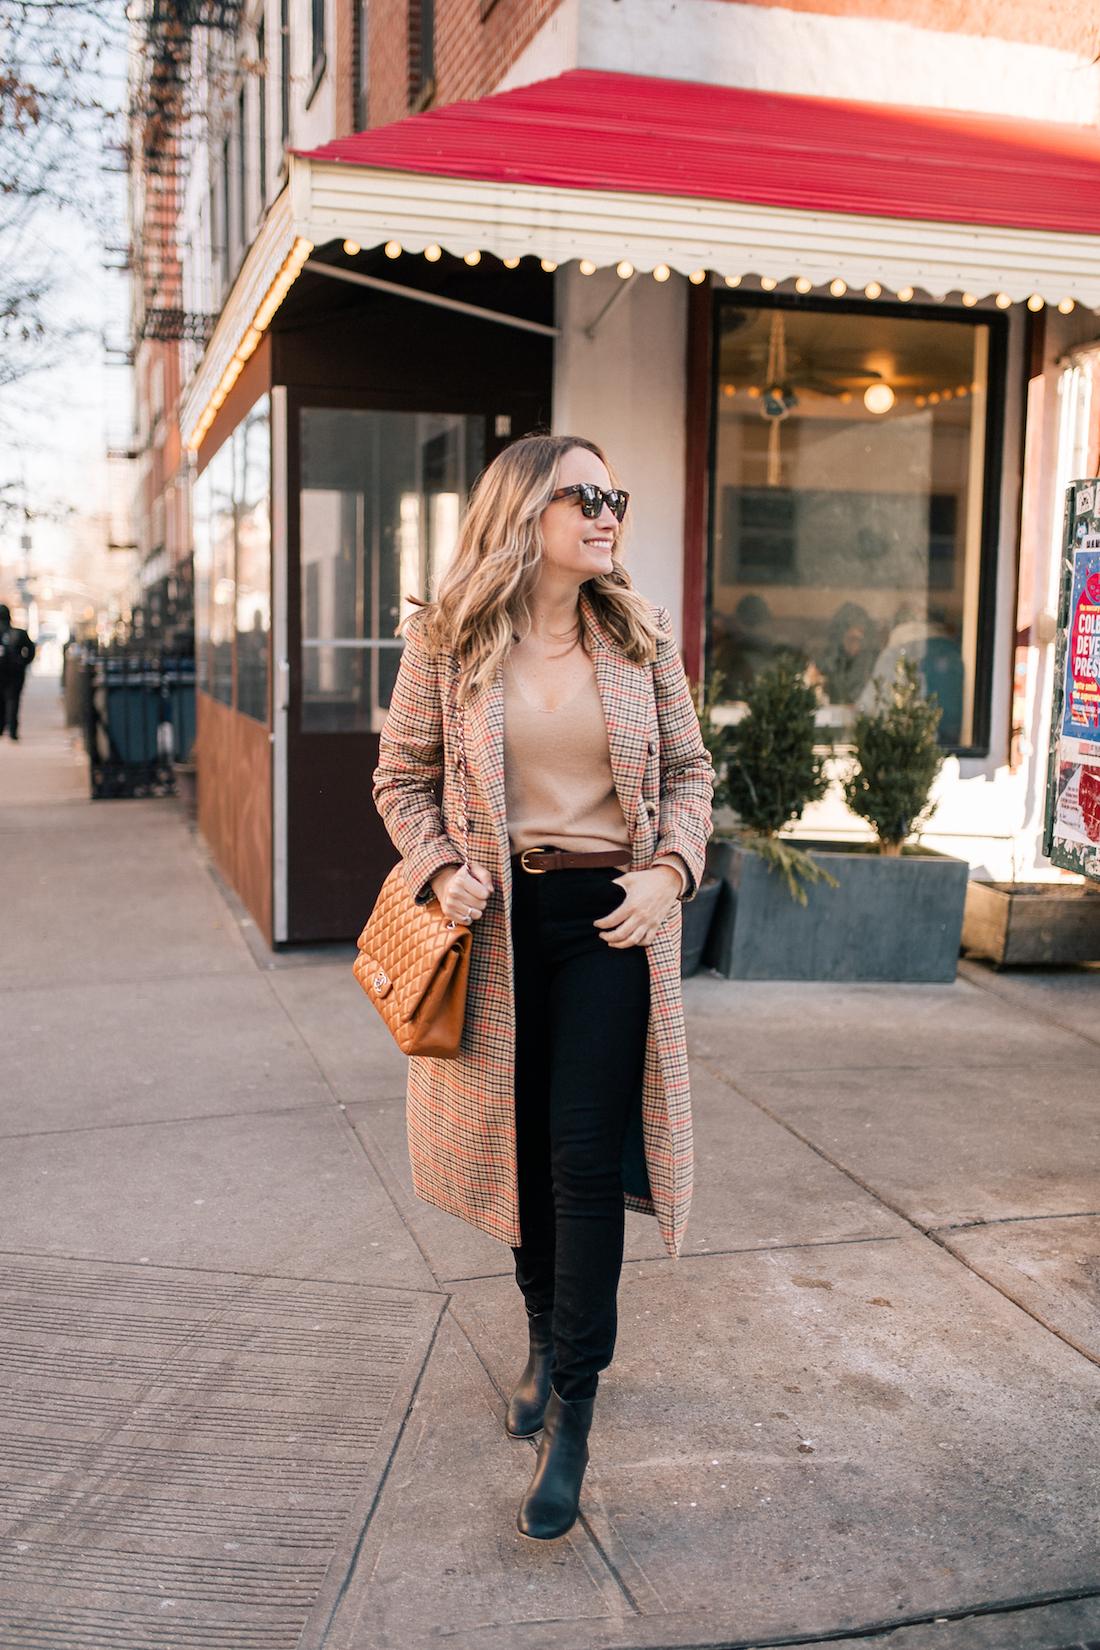 Grace Outfit Details:Topshop Coat // Theory Cashmere Sweater // Paige Jeans // Celine Sunglasses // J.Crew Belt // Soludos Boots // Chanel Purse